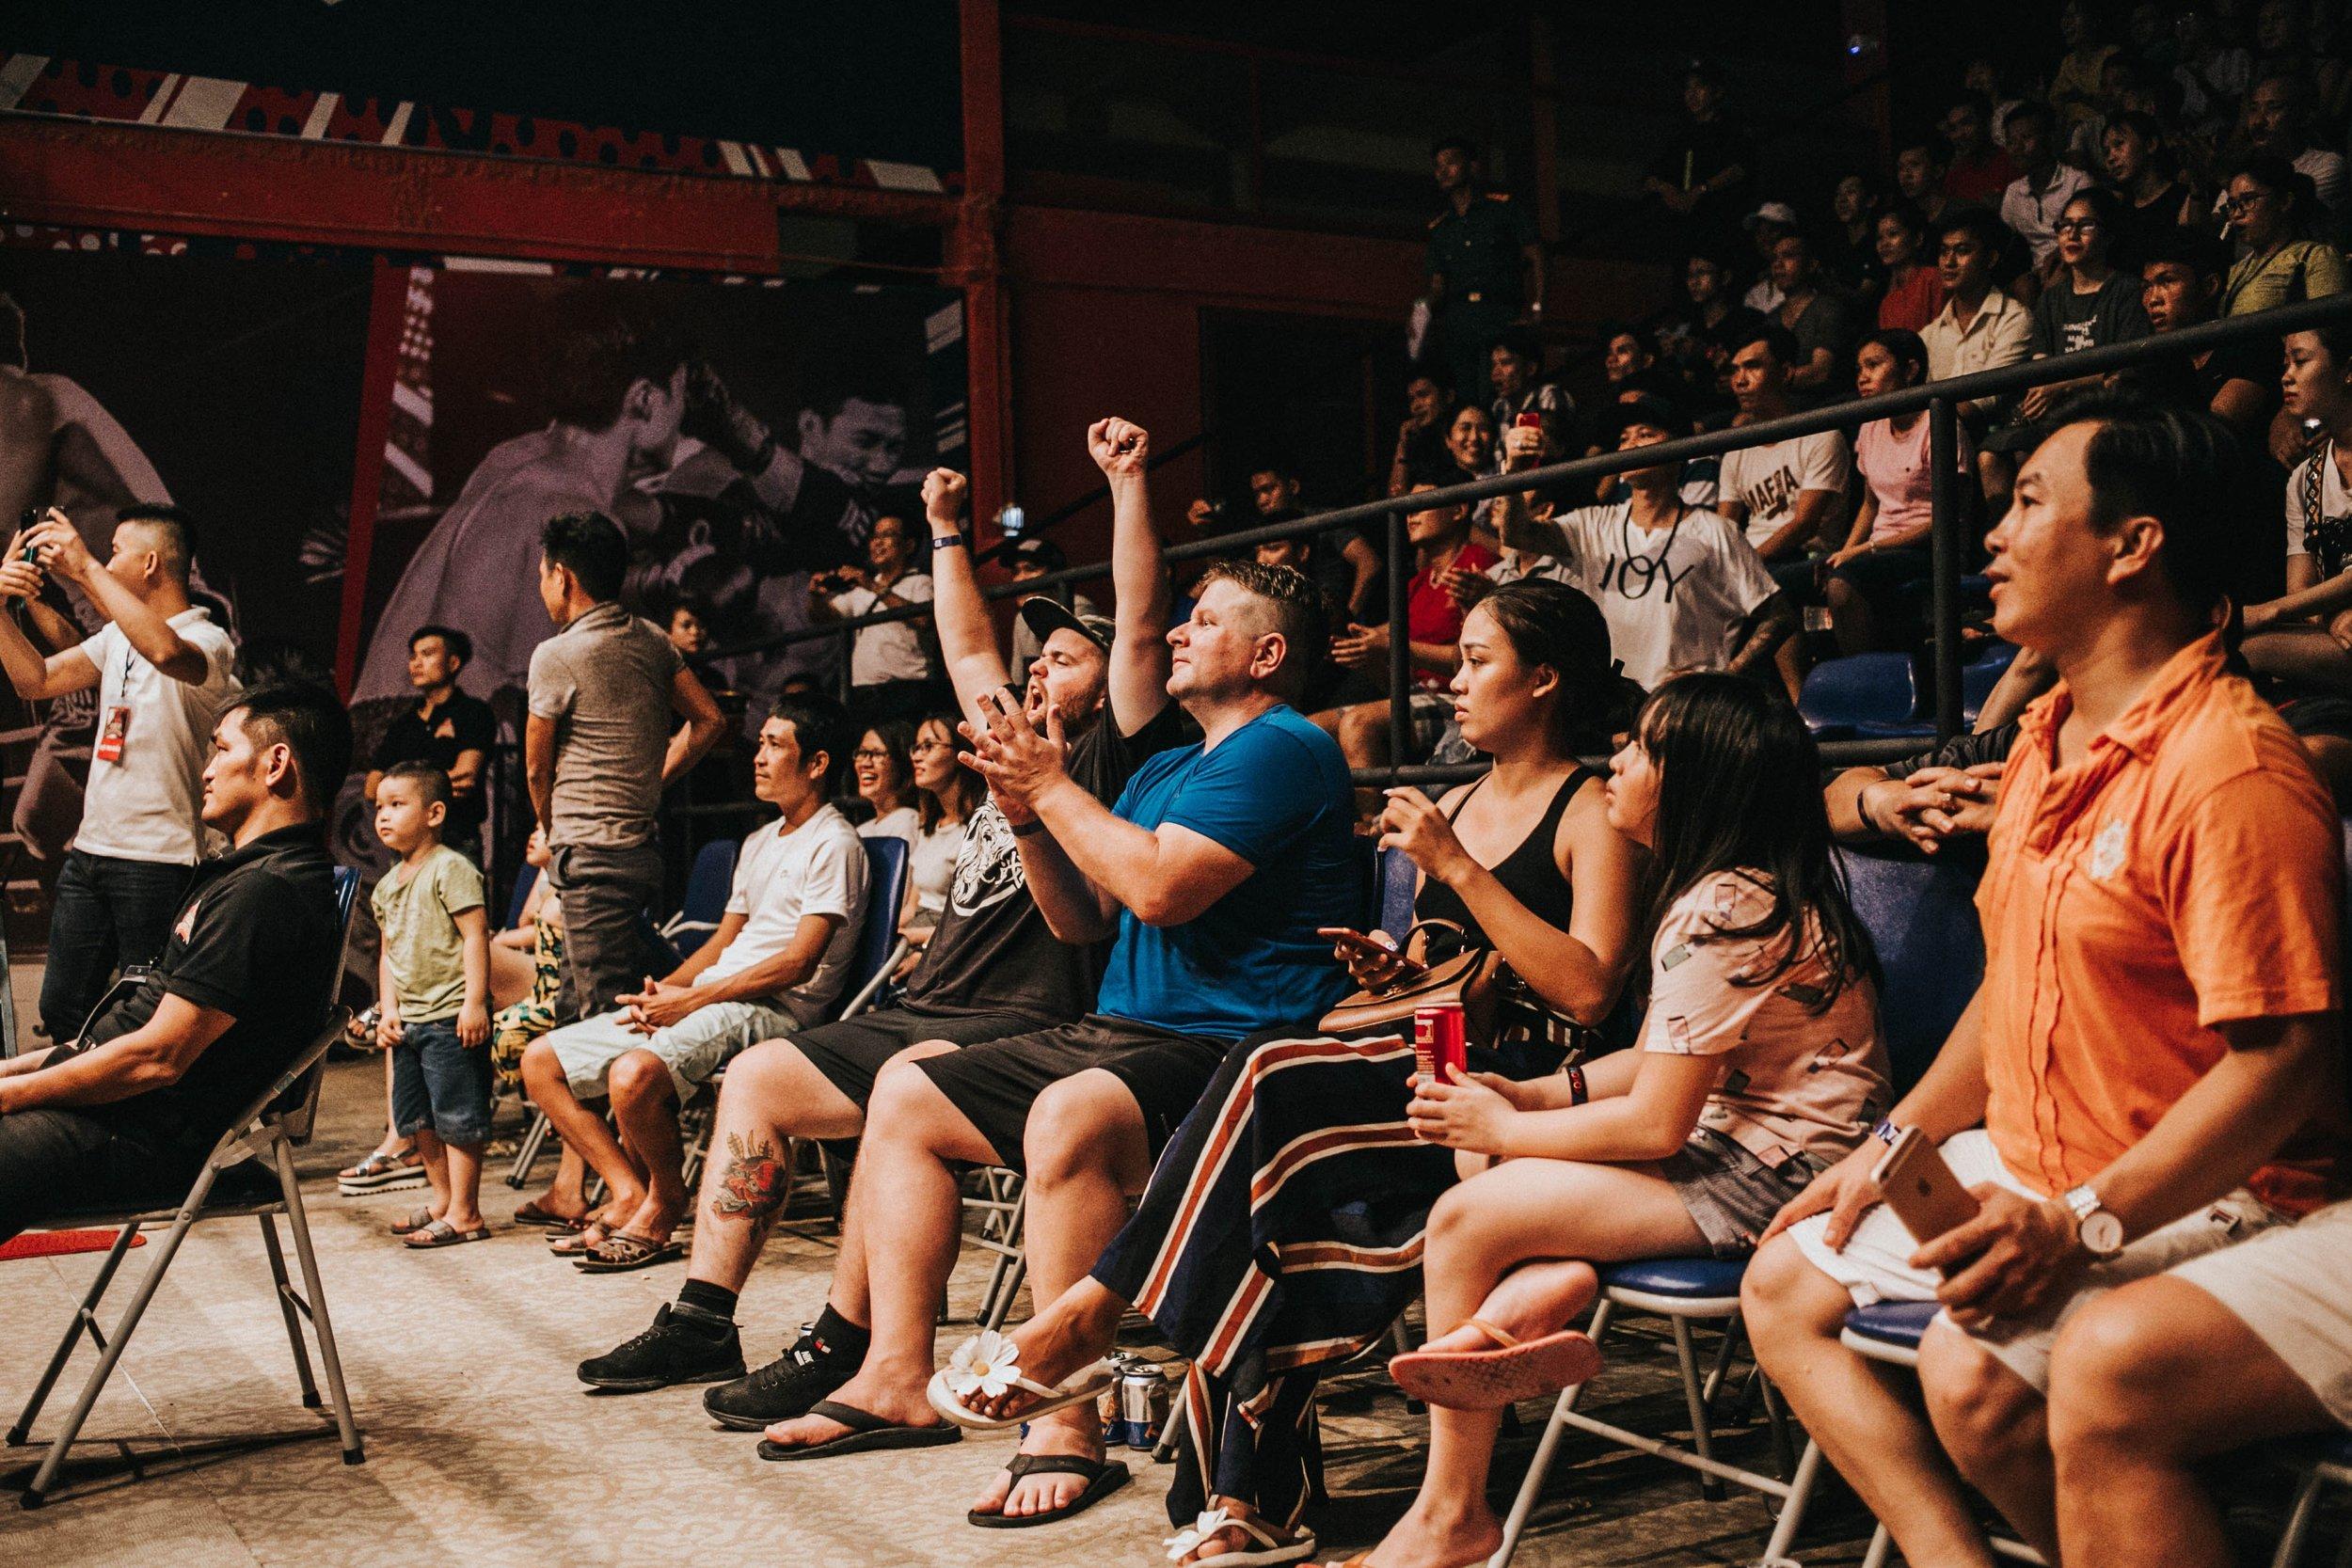 applause-audience-crowd-598626.jpg